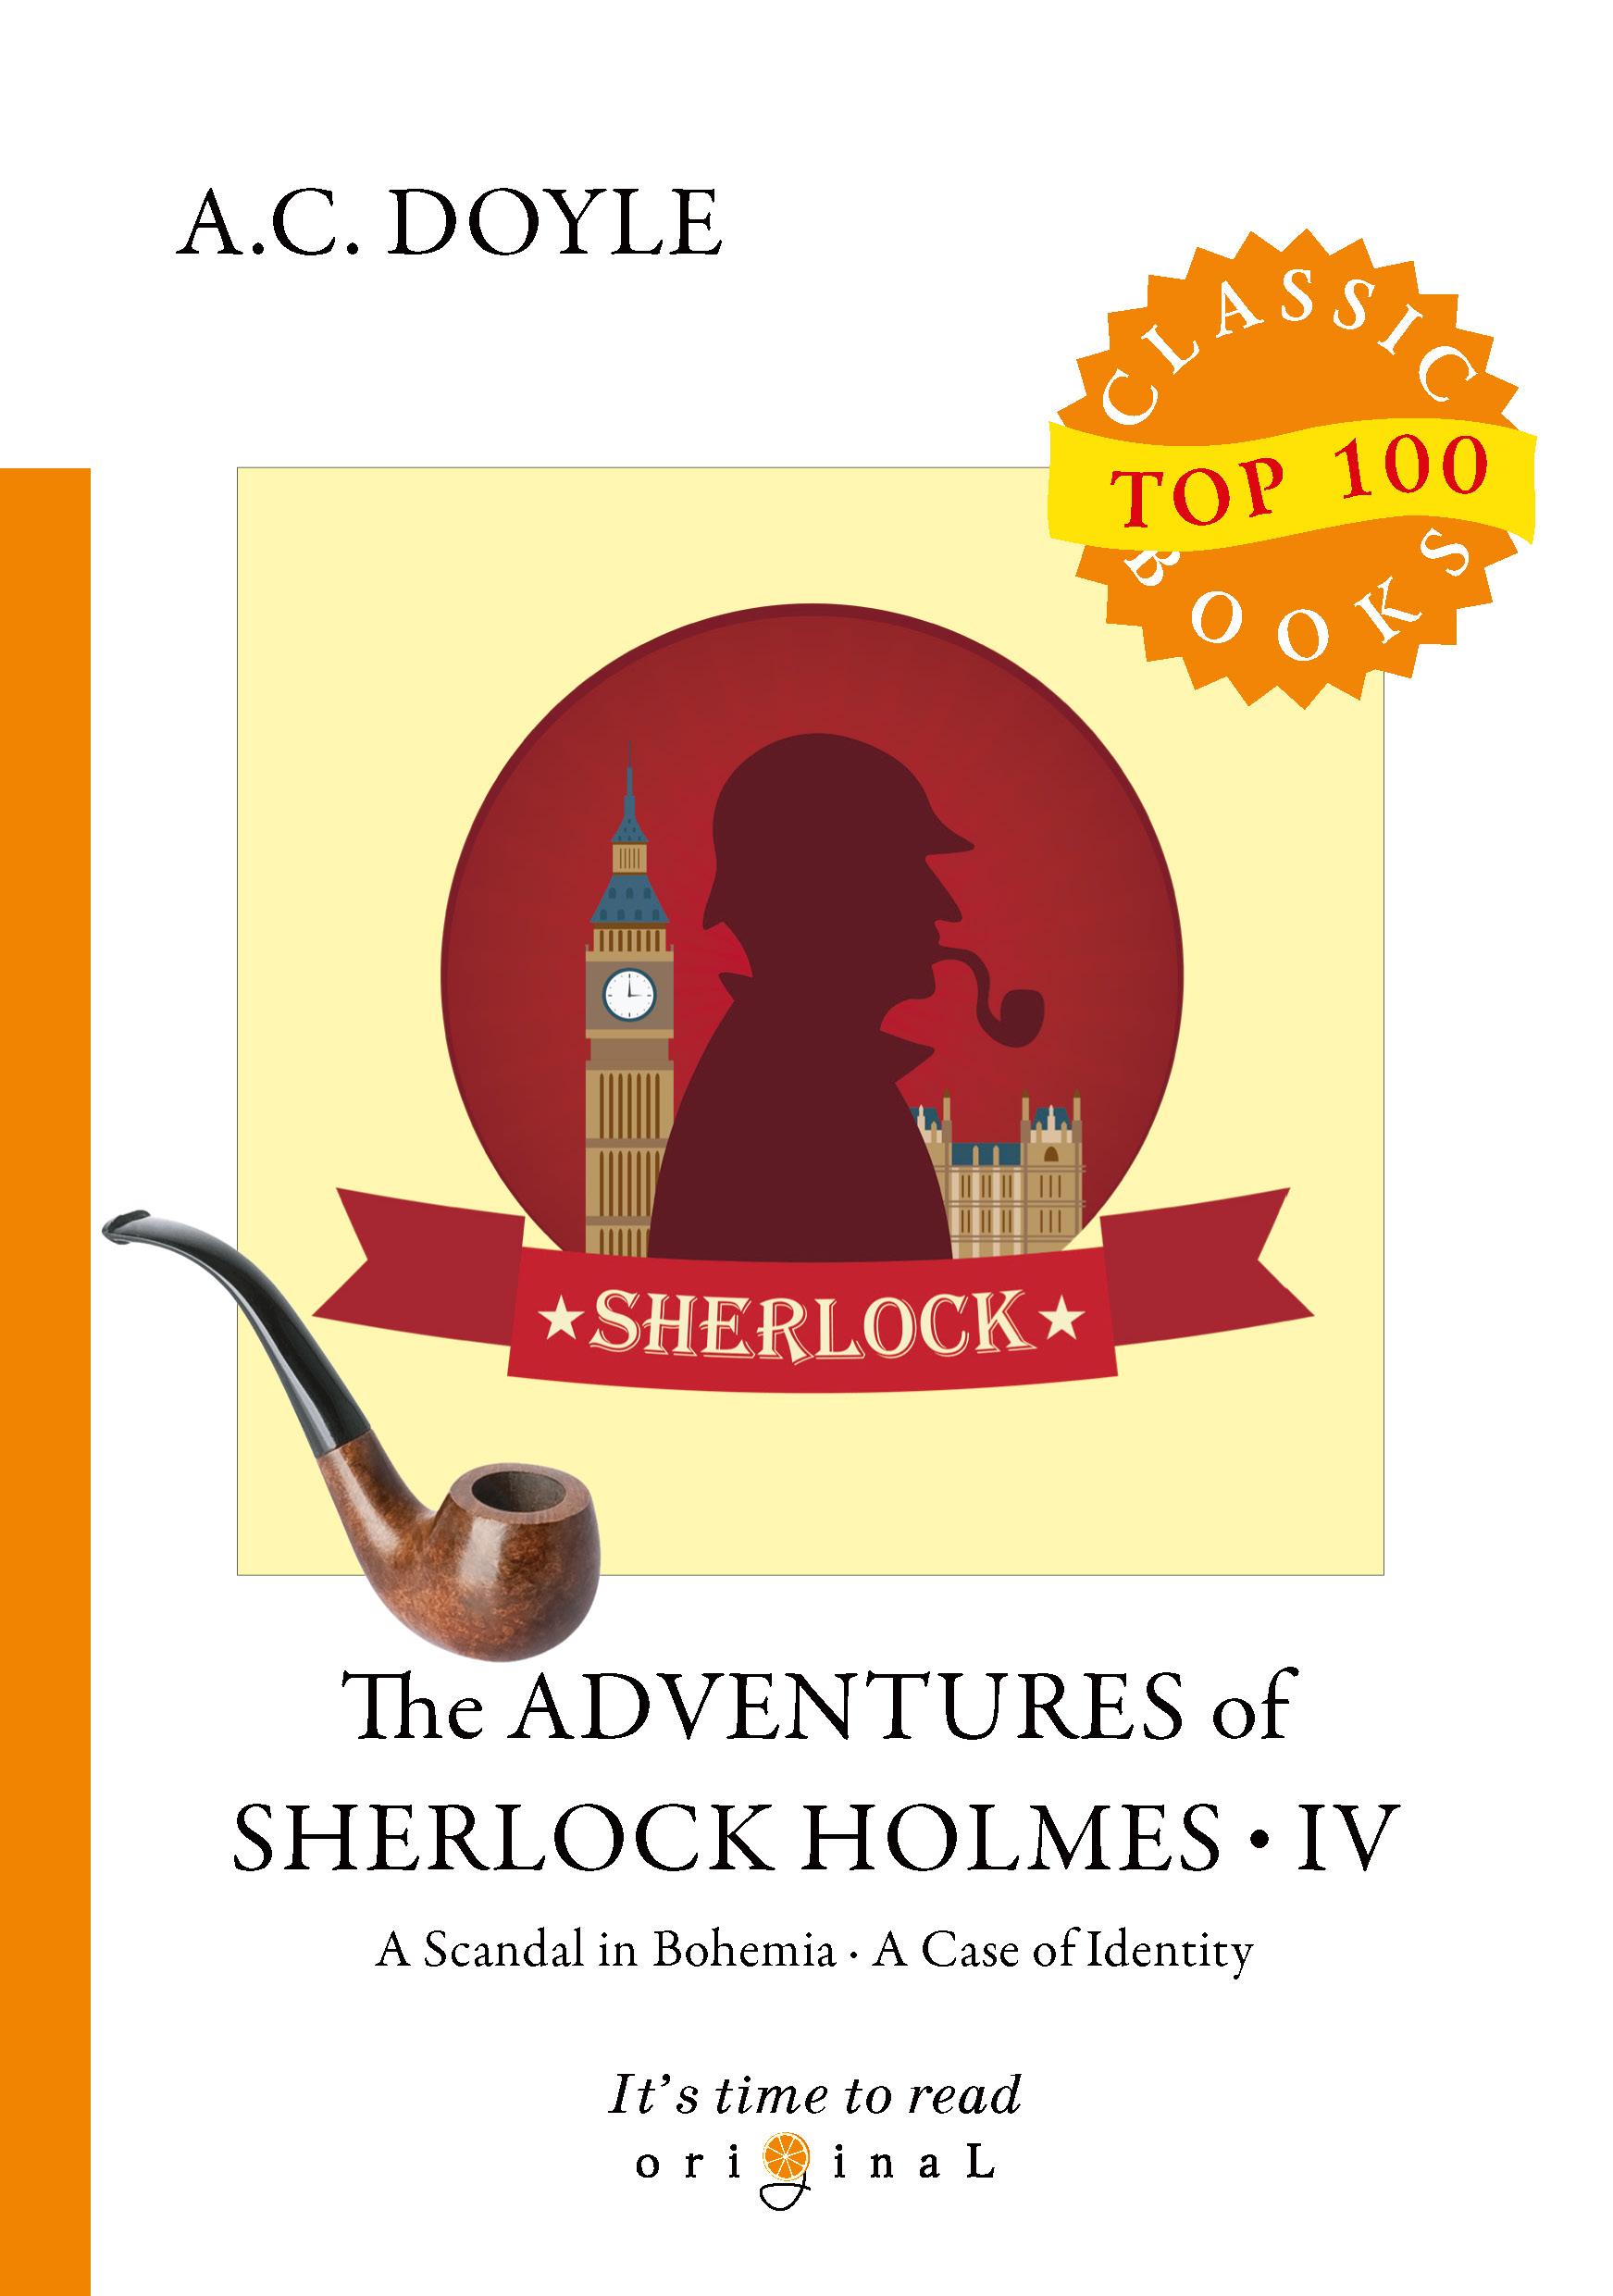 A. C. Doyle The Adventures of Sherlock Holmes IV a c doyle the exploits of brigadier gerard